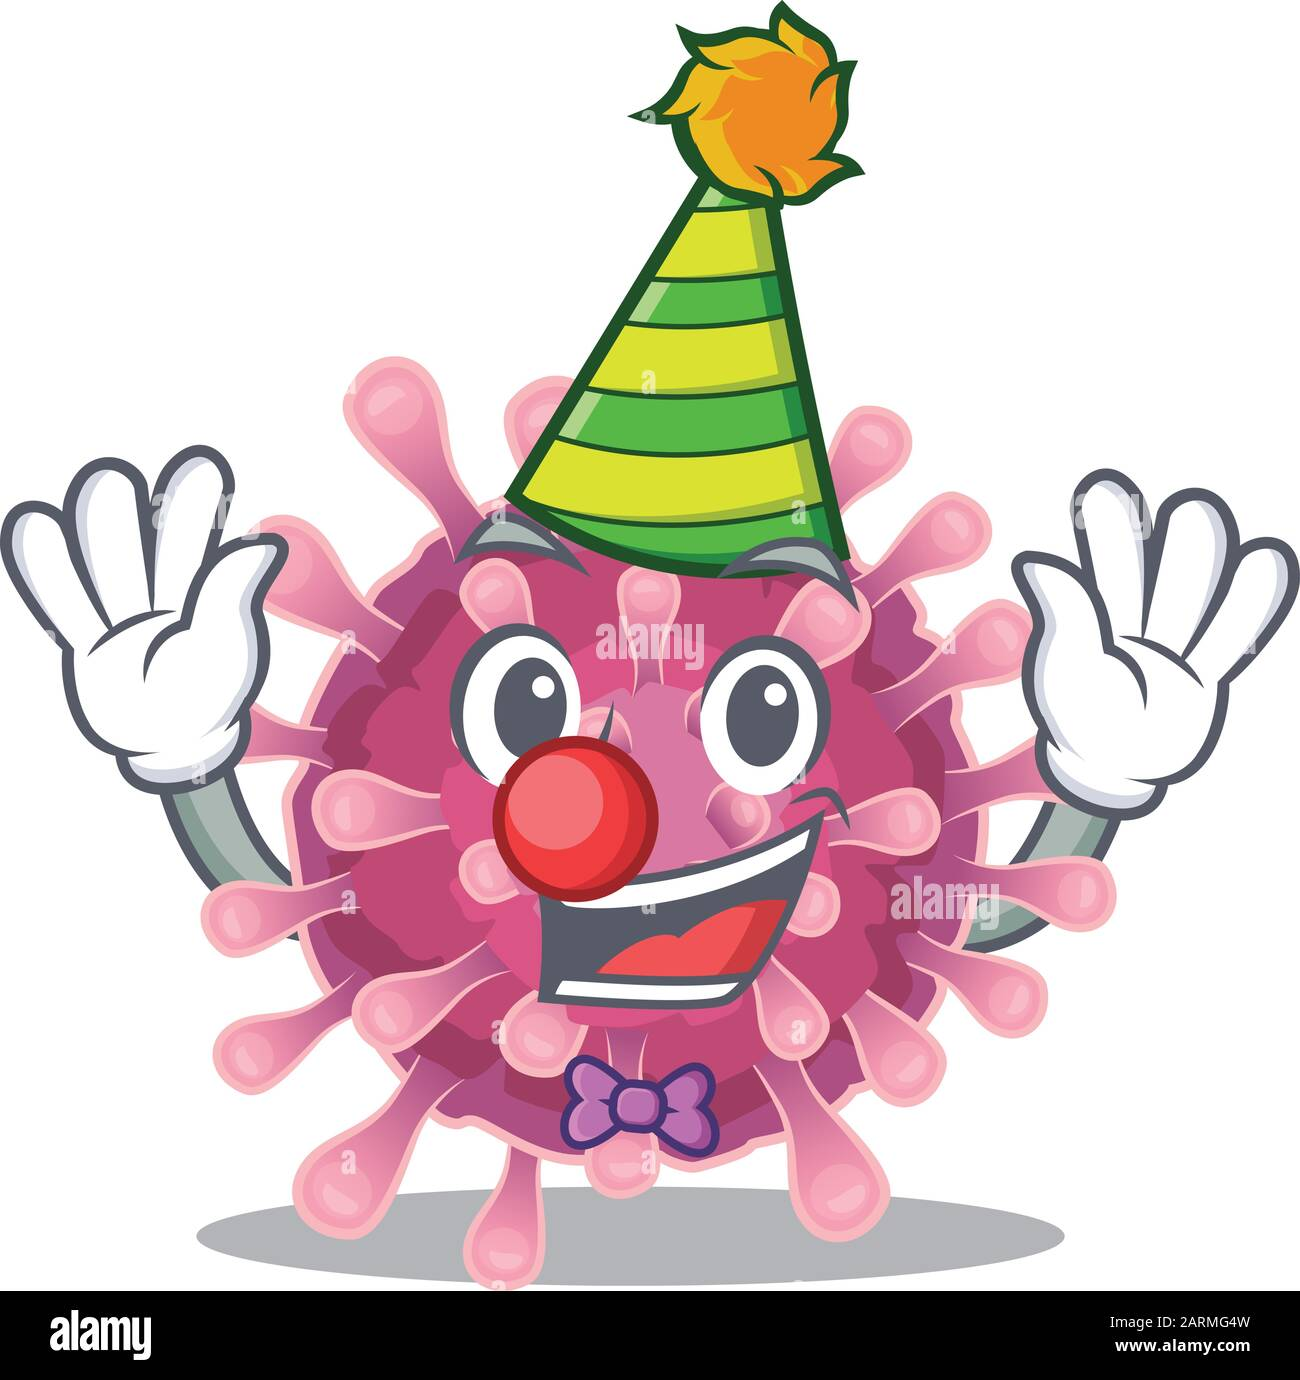 funny clown corona virus cartoon character mascot design stock vector image art alamy https www alamy com funny clown corona virus cartoon character mascot design image341585801 html